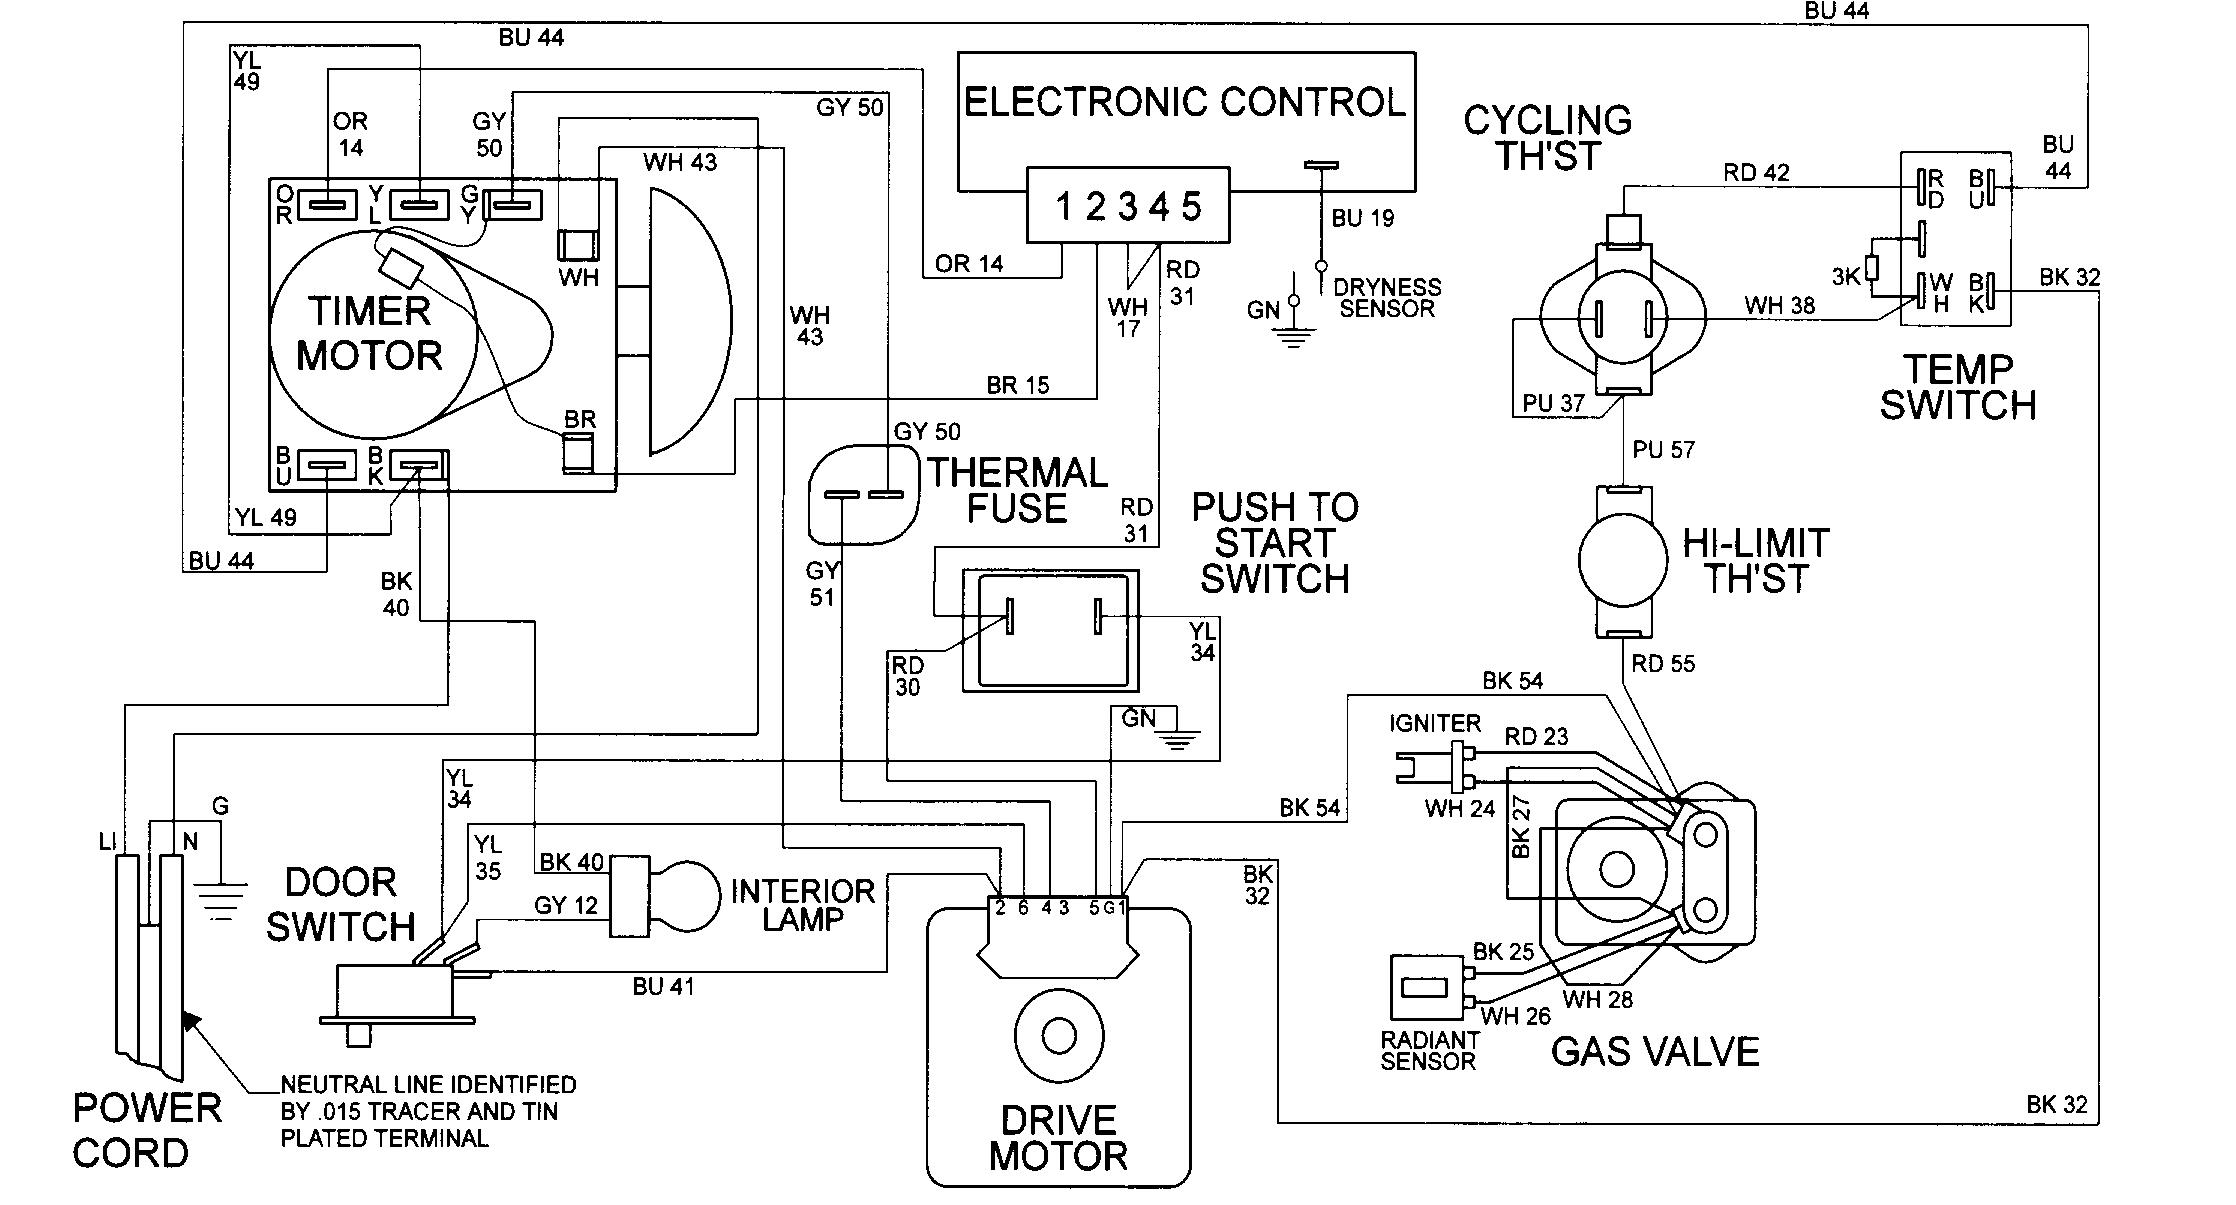 maytag centennial dryer diagram free download wiring diagrams